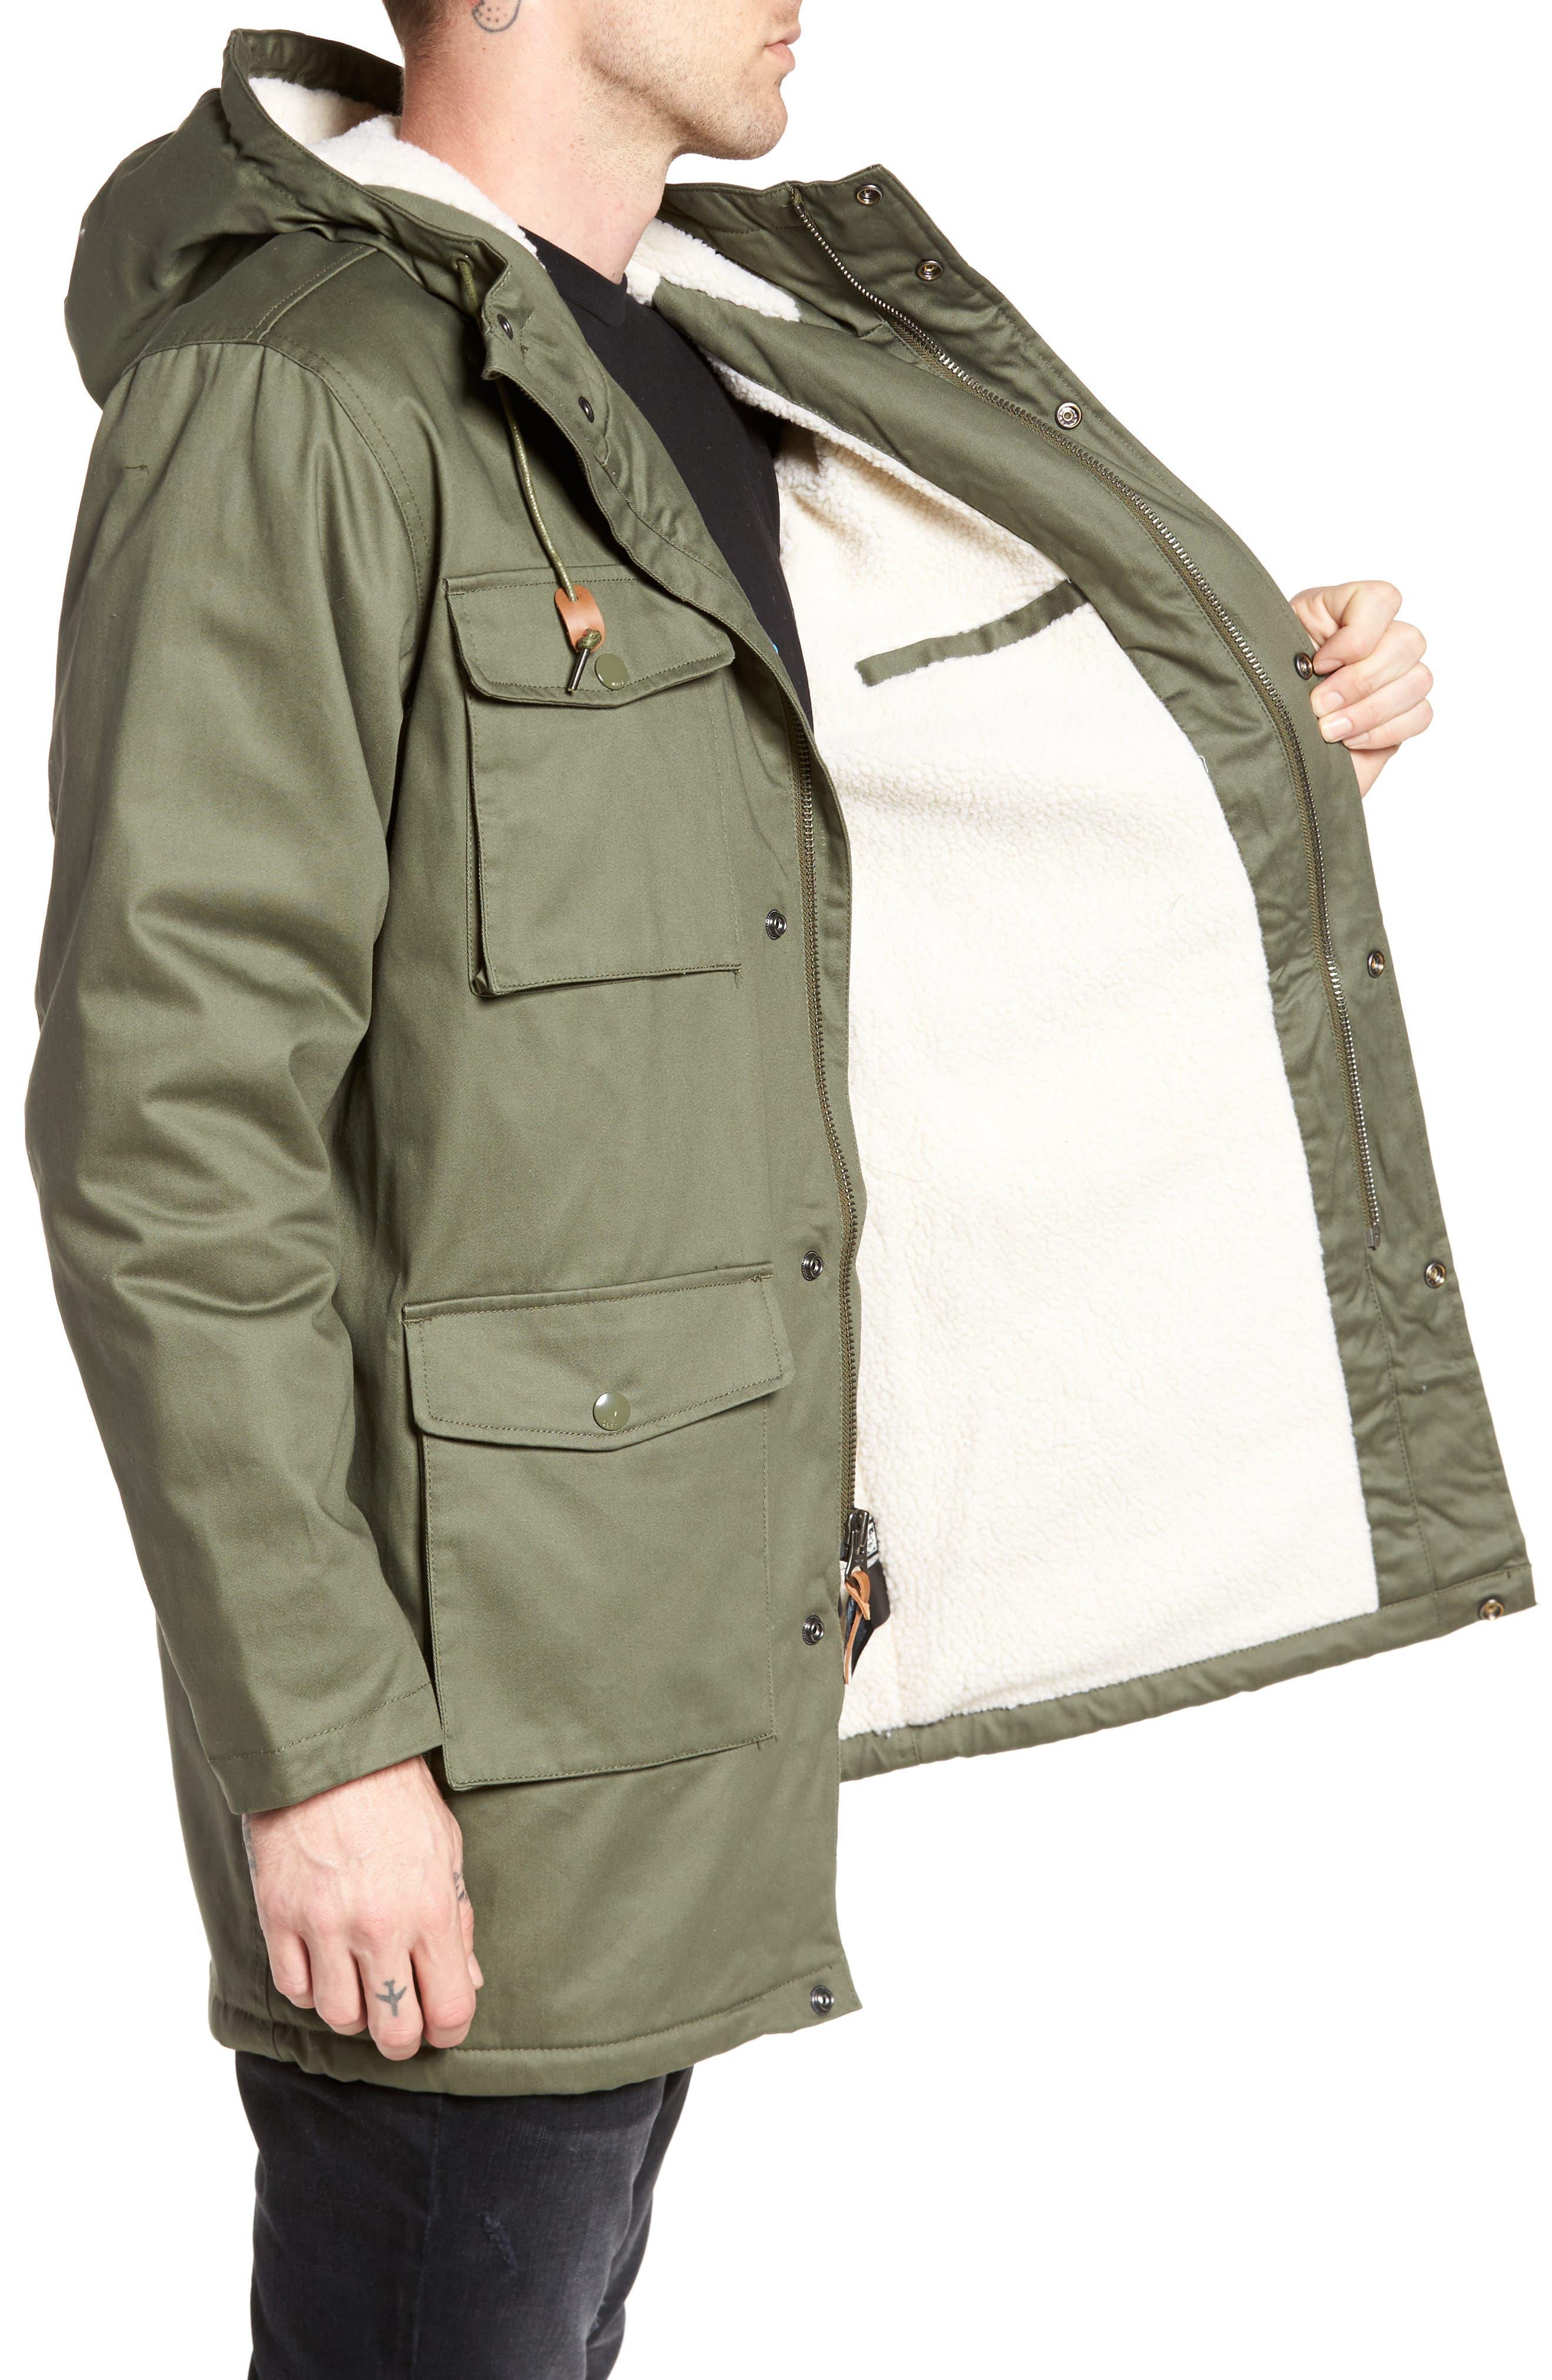 Heller II Jacket,                             Alternate thumbnail 3, color,                             Army